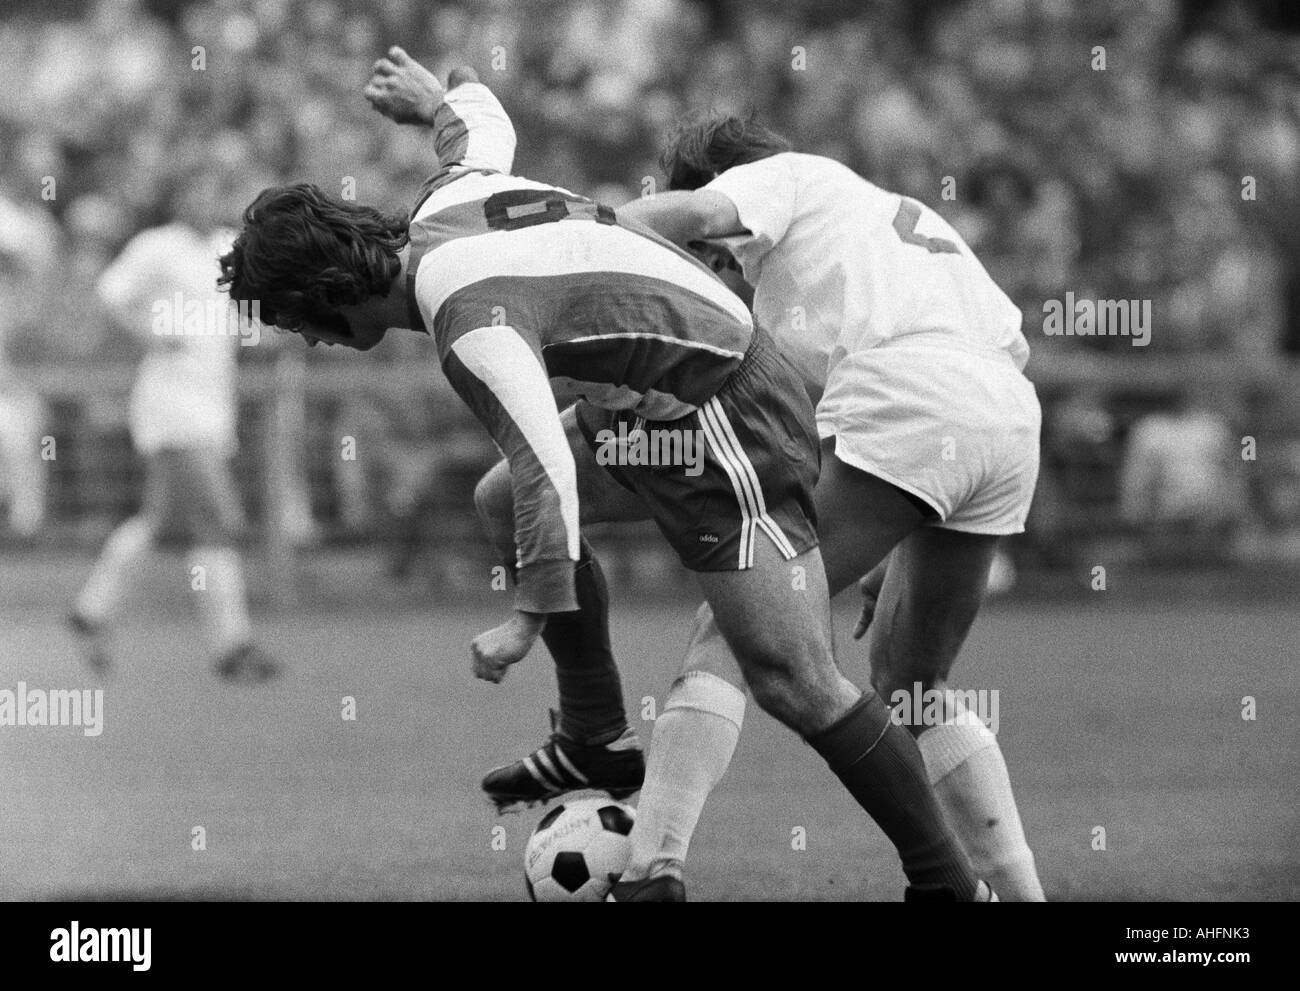 football, Bundesliga, 1971/1972, Stadium Radrennbahn near the Muengersdorfer Stadium in Cologne, 1. FC Cologne versus FC Bayern Munich 1:4, scene of the match, duel between Gerd Mueller (FCB) left and Jupp Kapellmann (Koeln) - Stock Image